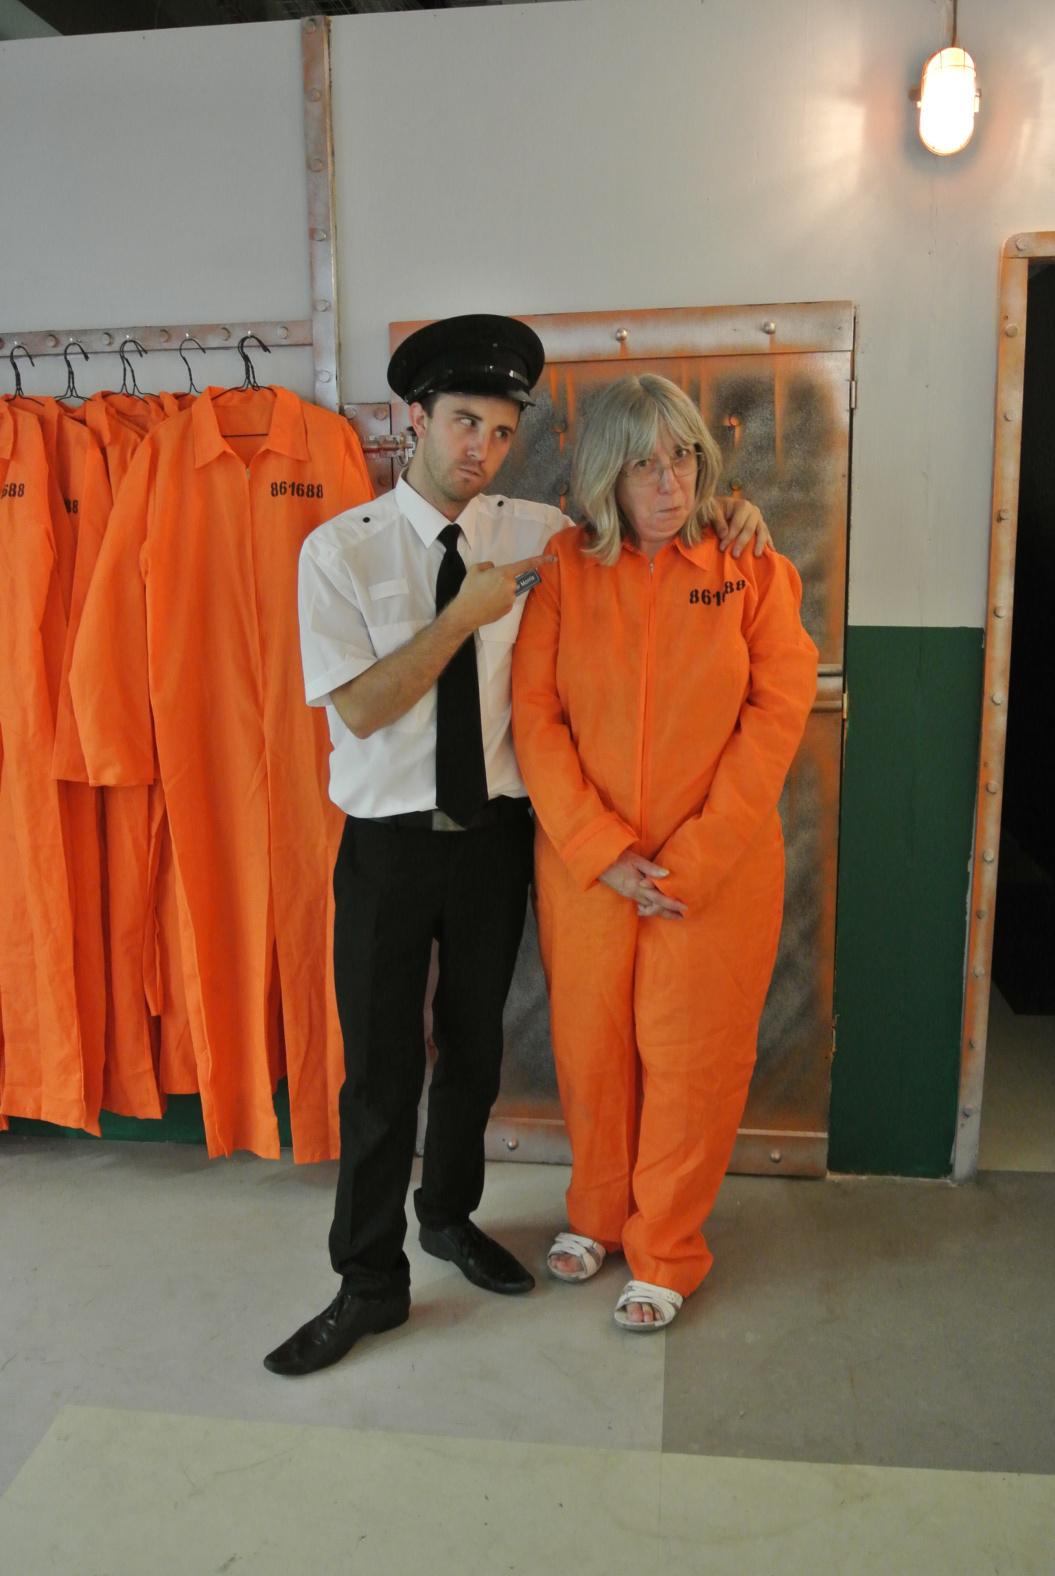 Jail Break - photo by Juliamaud